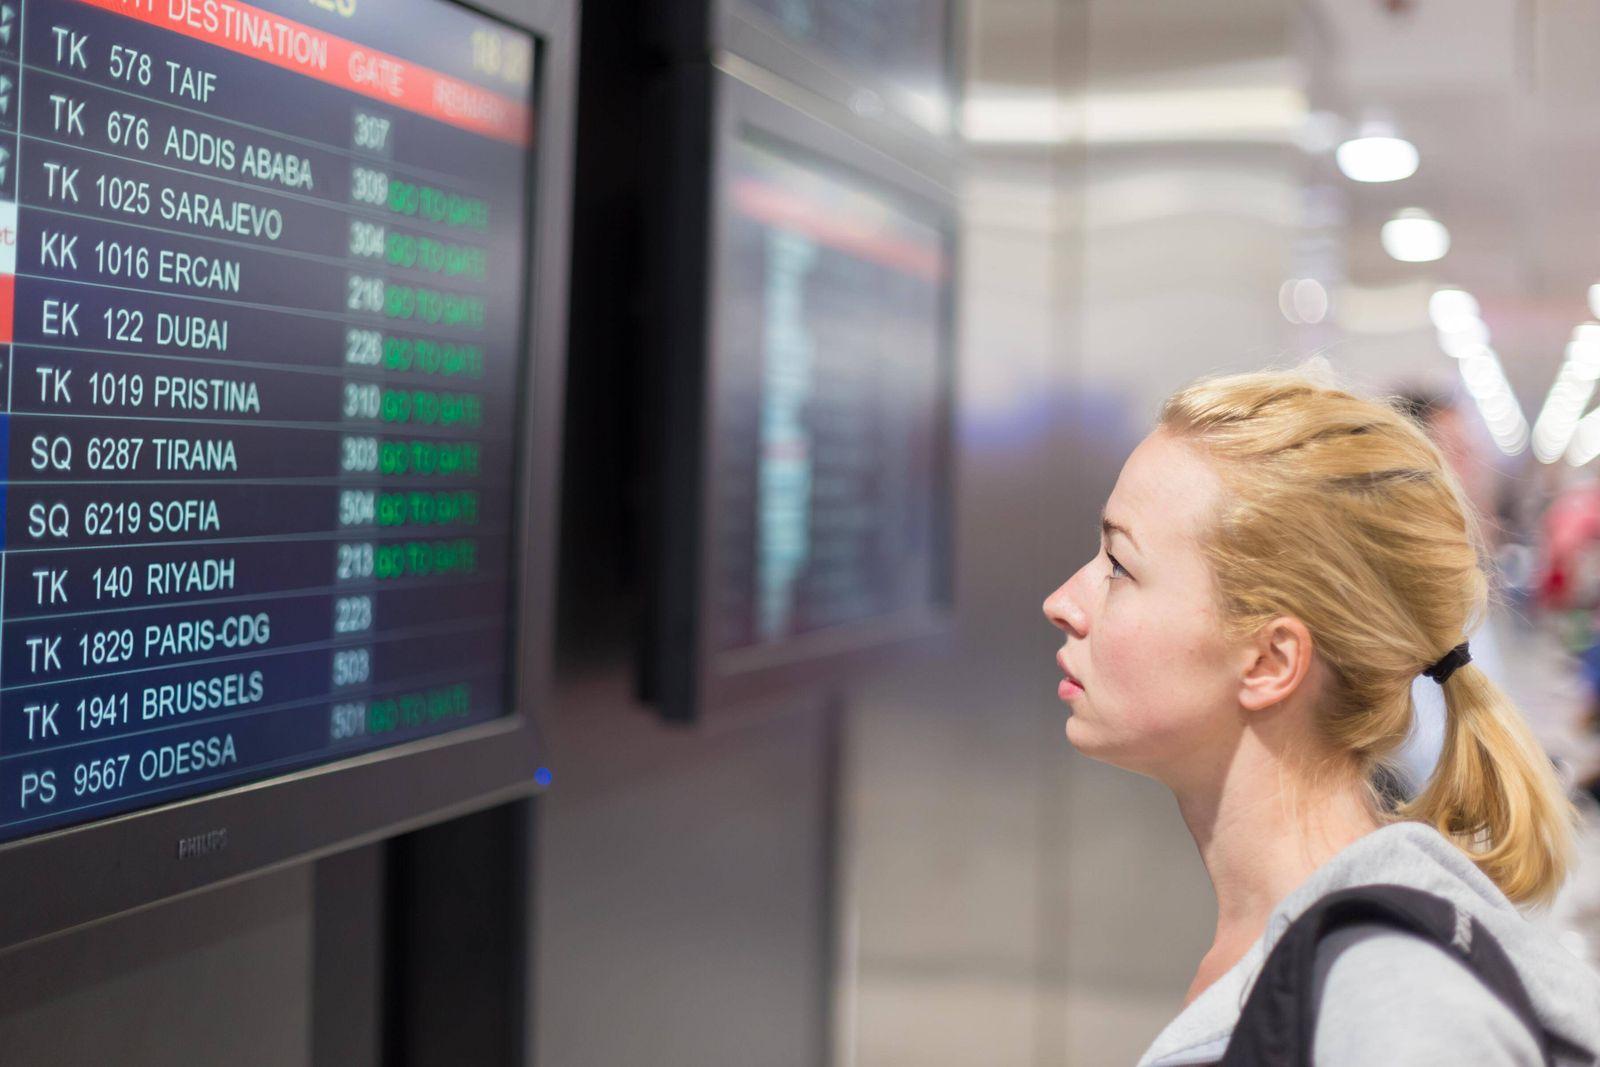 Passenger looking at flight information board model released Symbolfoto PUBLICATIONxINxGERxSUIxA